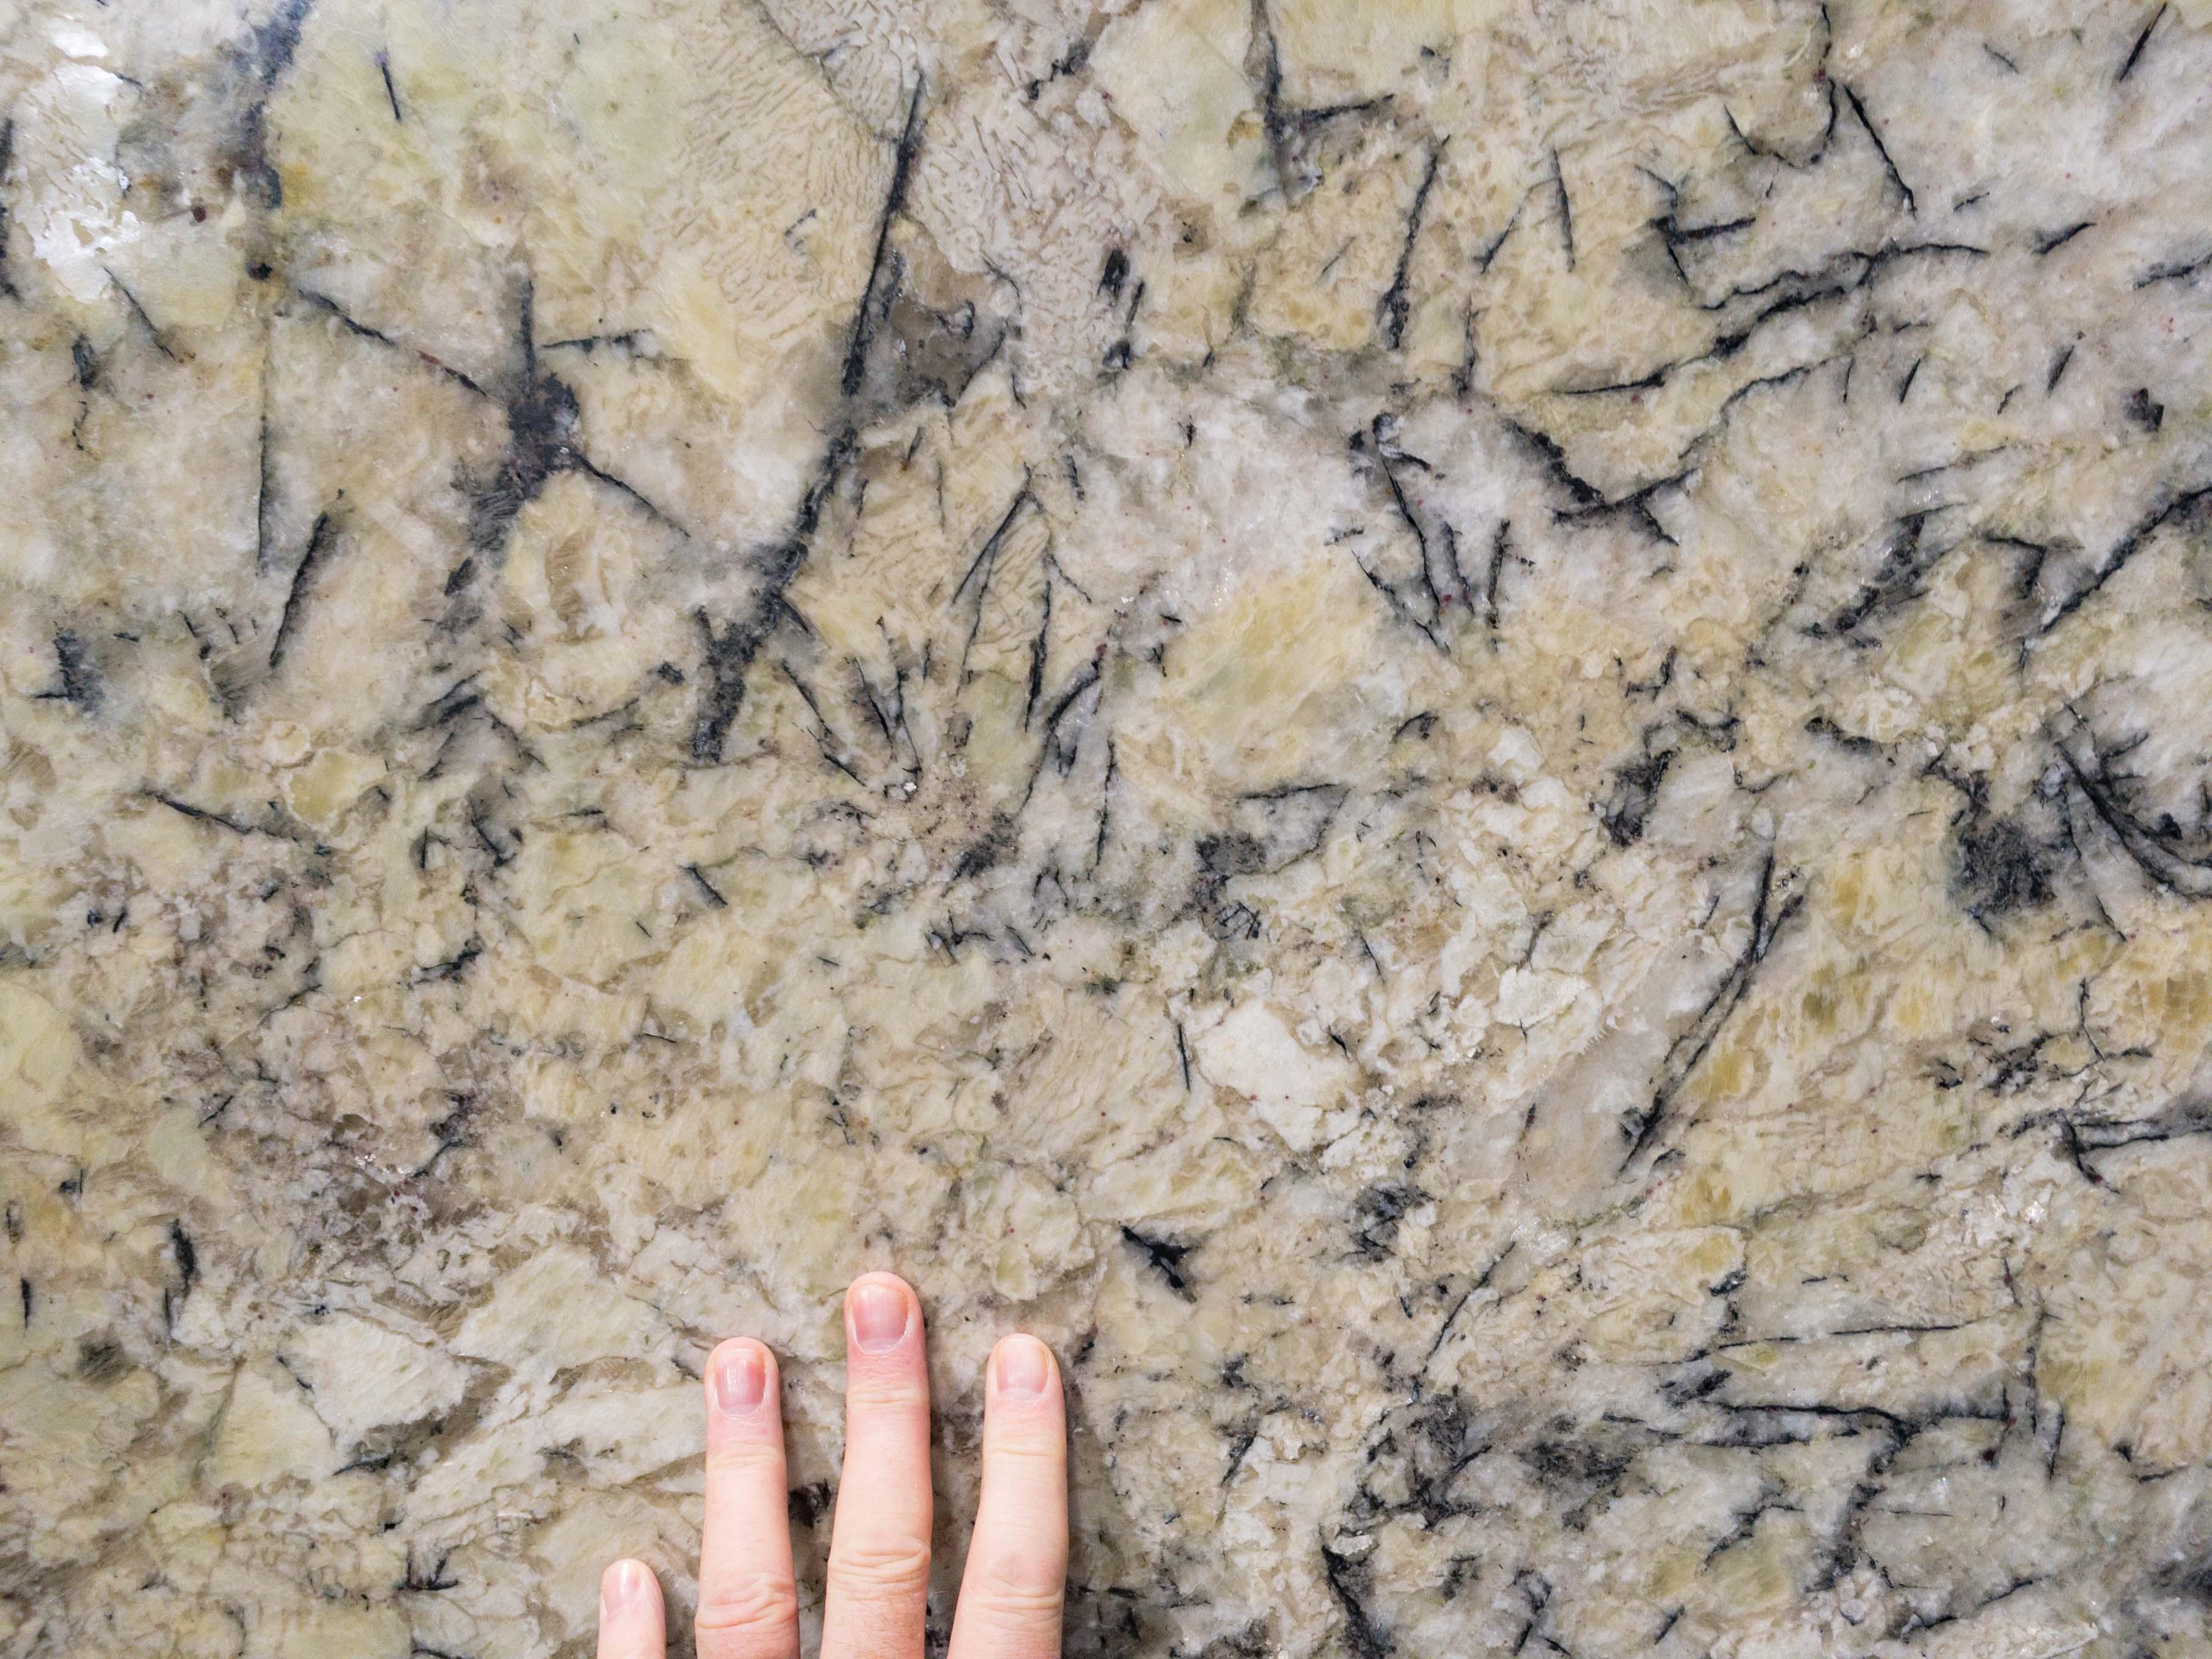 Arctic Cream Granite MG181024 34262 155514 a